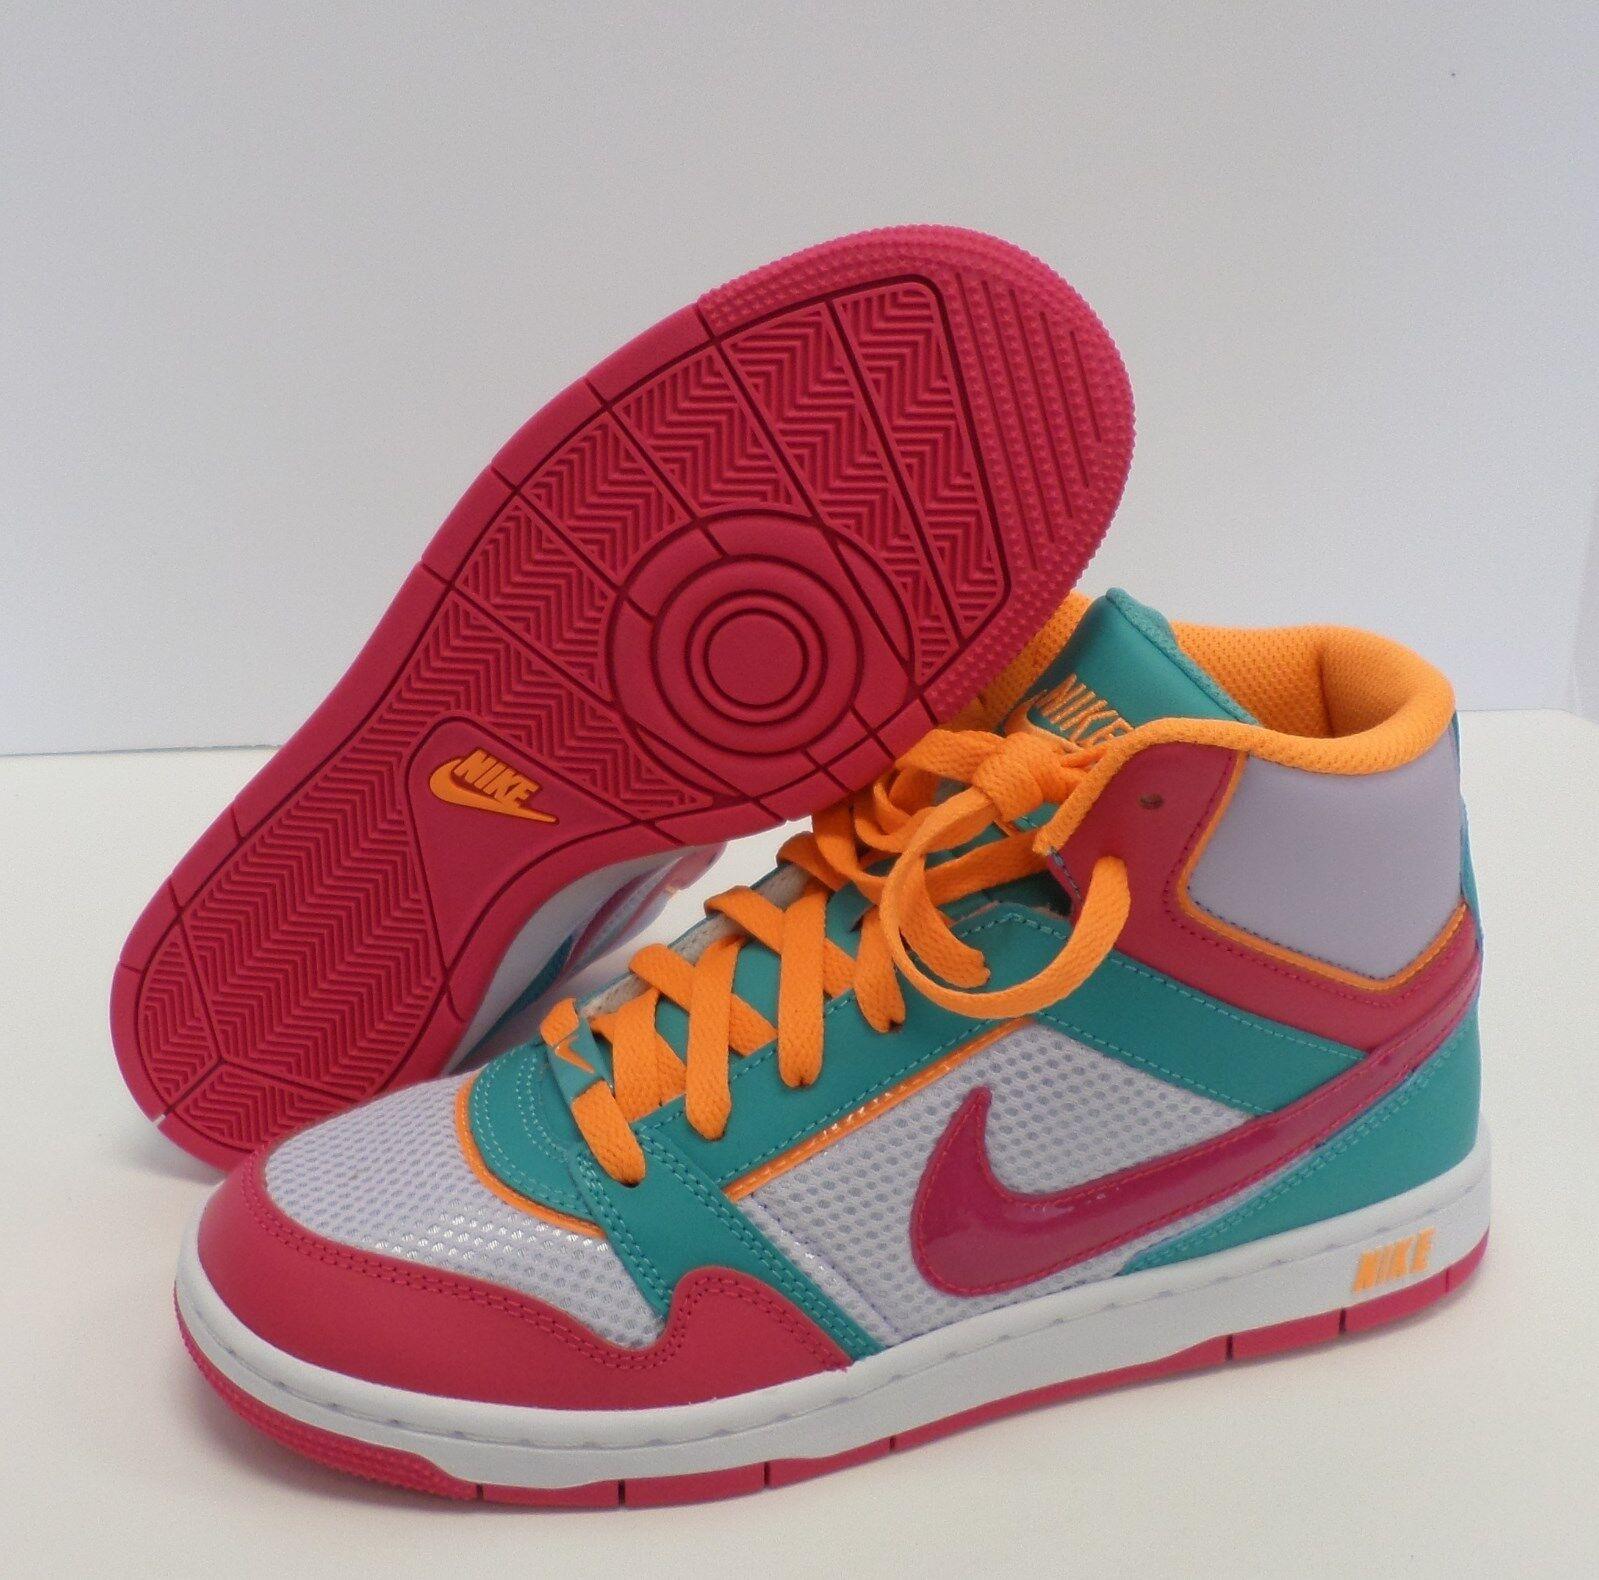 Nike damen Prestige 3 Skinny High Weiß Rosa Grün Orange Orange Orange 551649-564 8eda2c